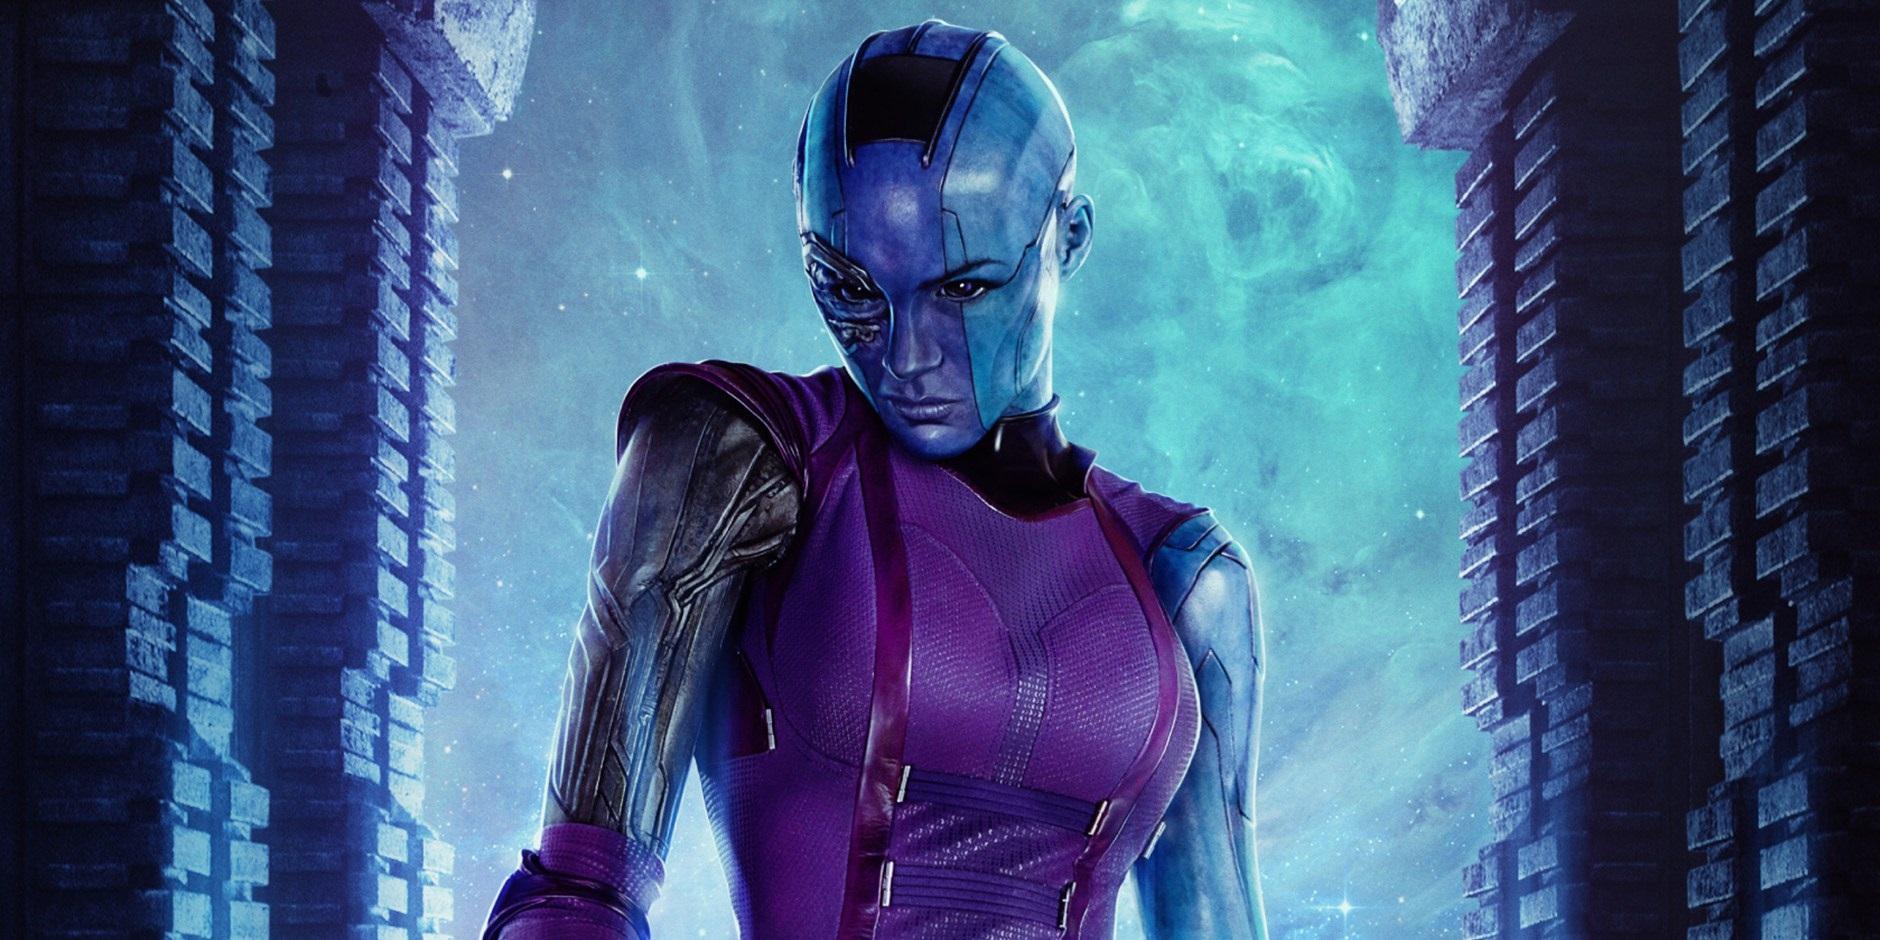 Karen Gillan to appear in next Avengers film